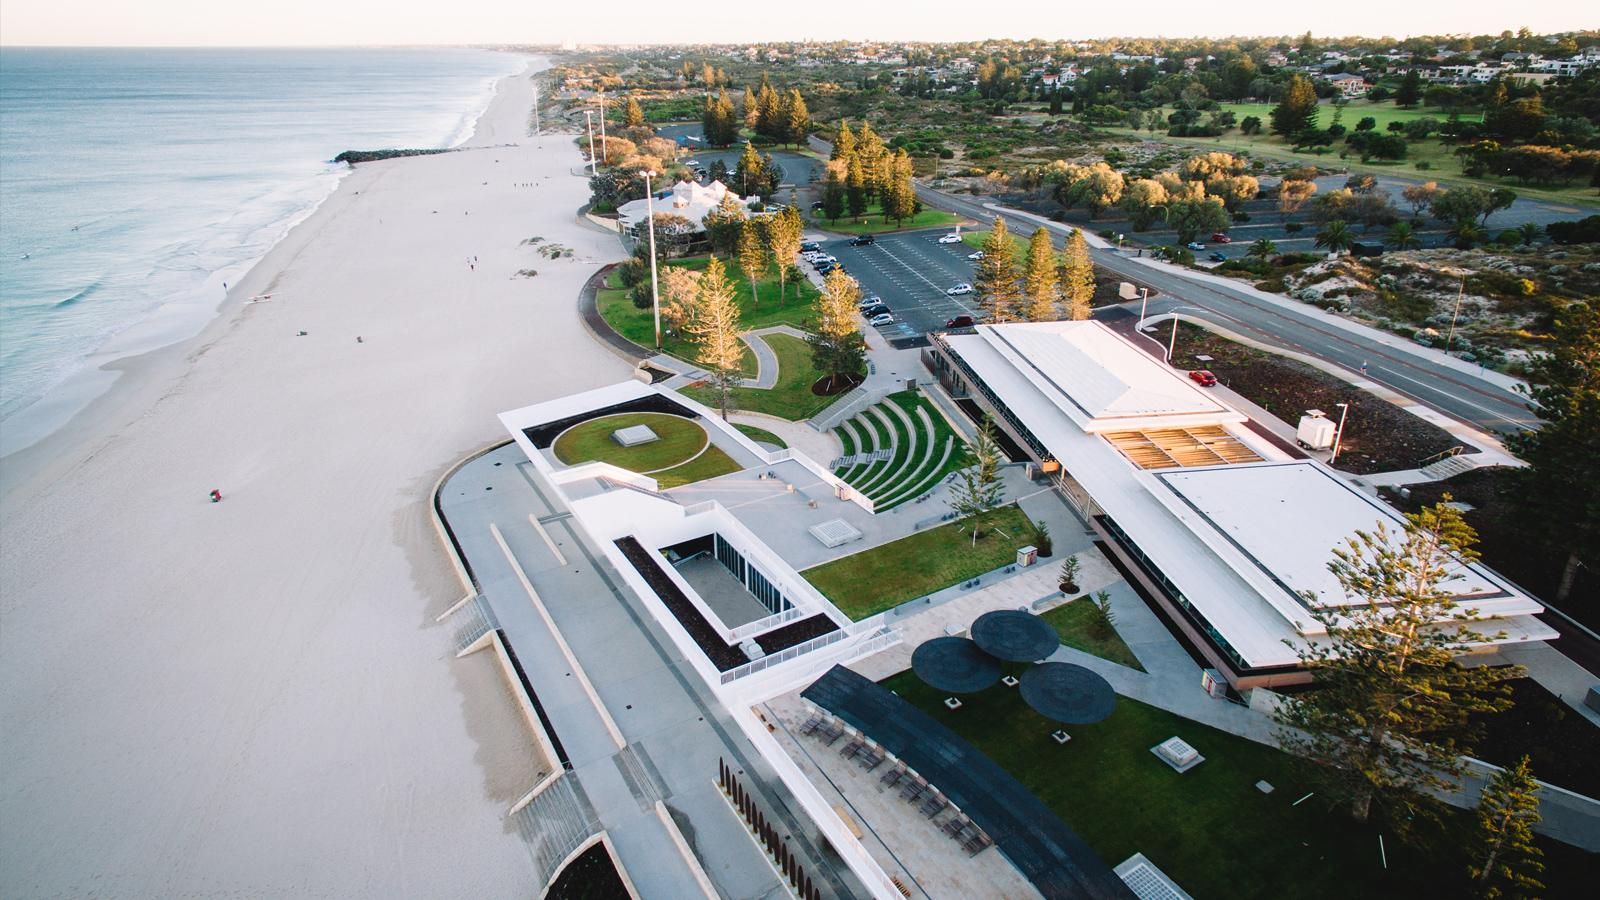 city beach surf club architecture design